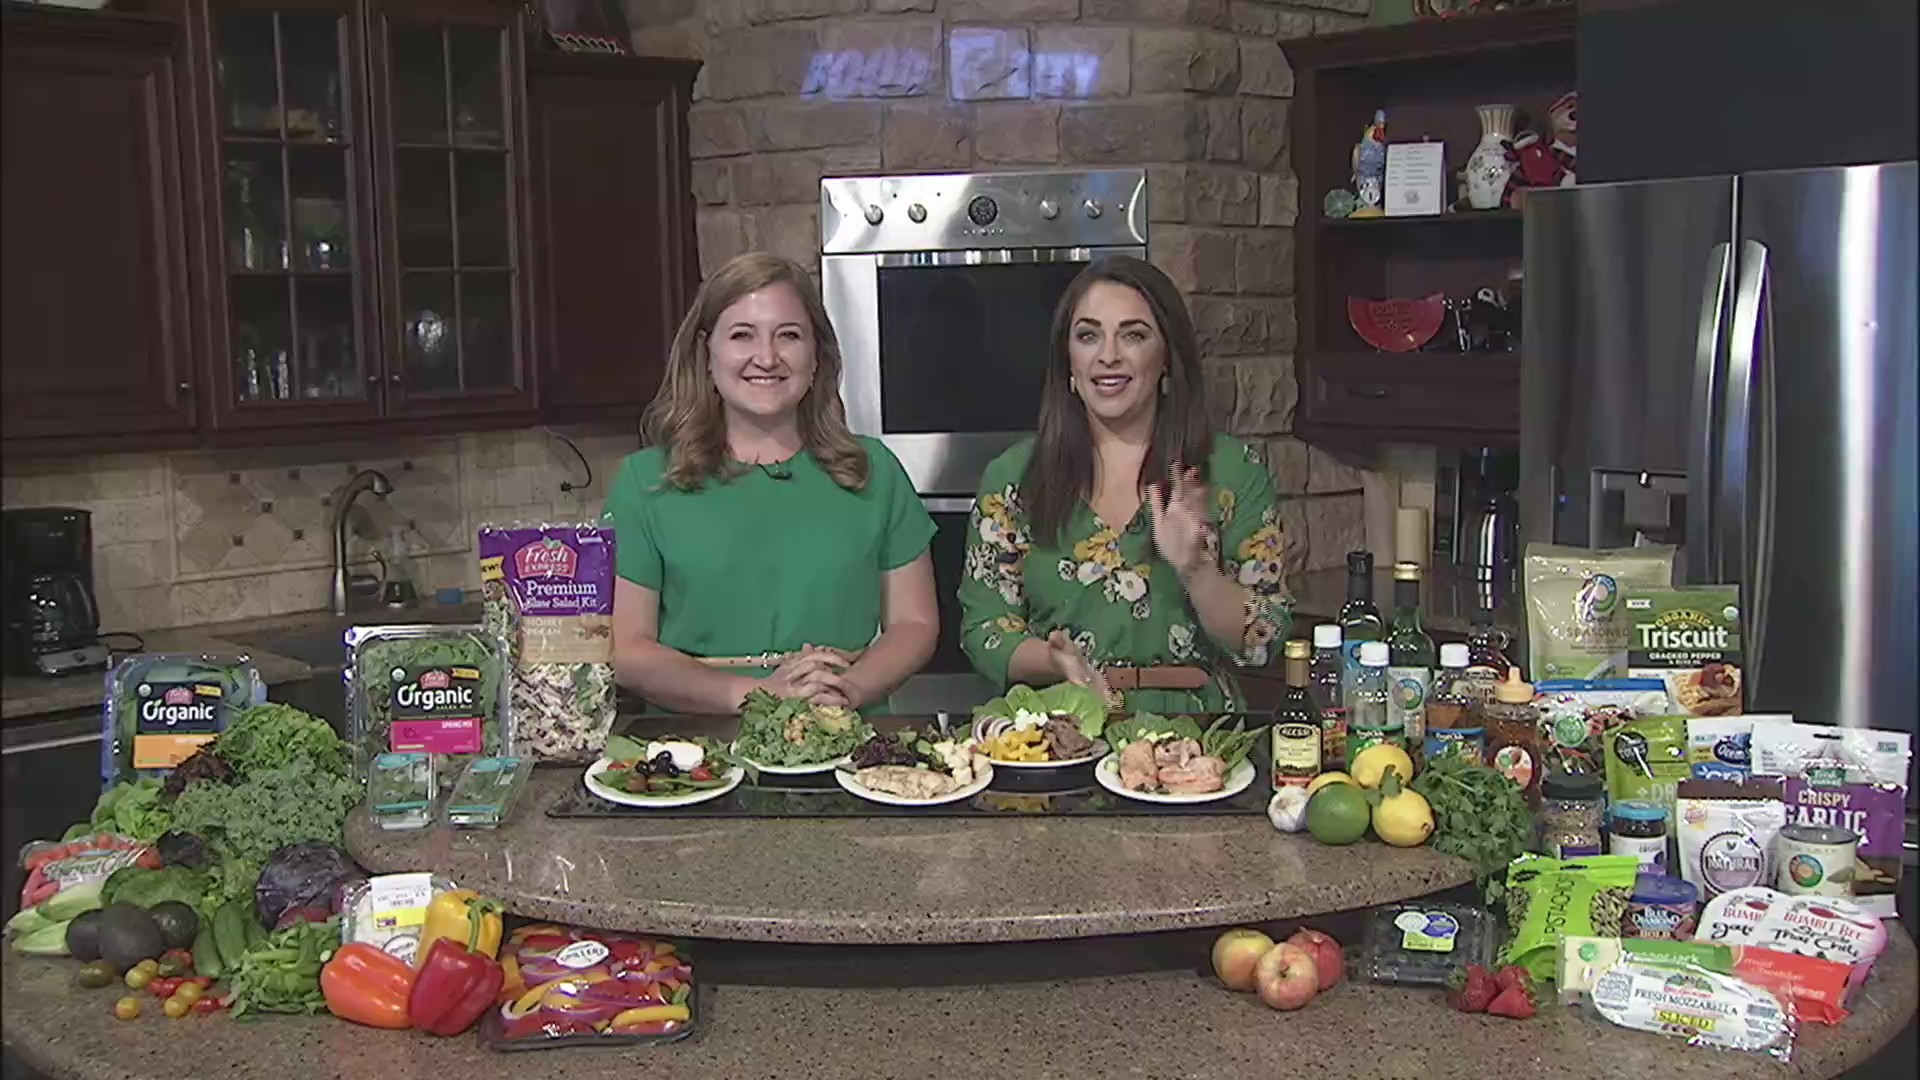 Sensational Summer Salads with Food City (Pt. 1)